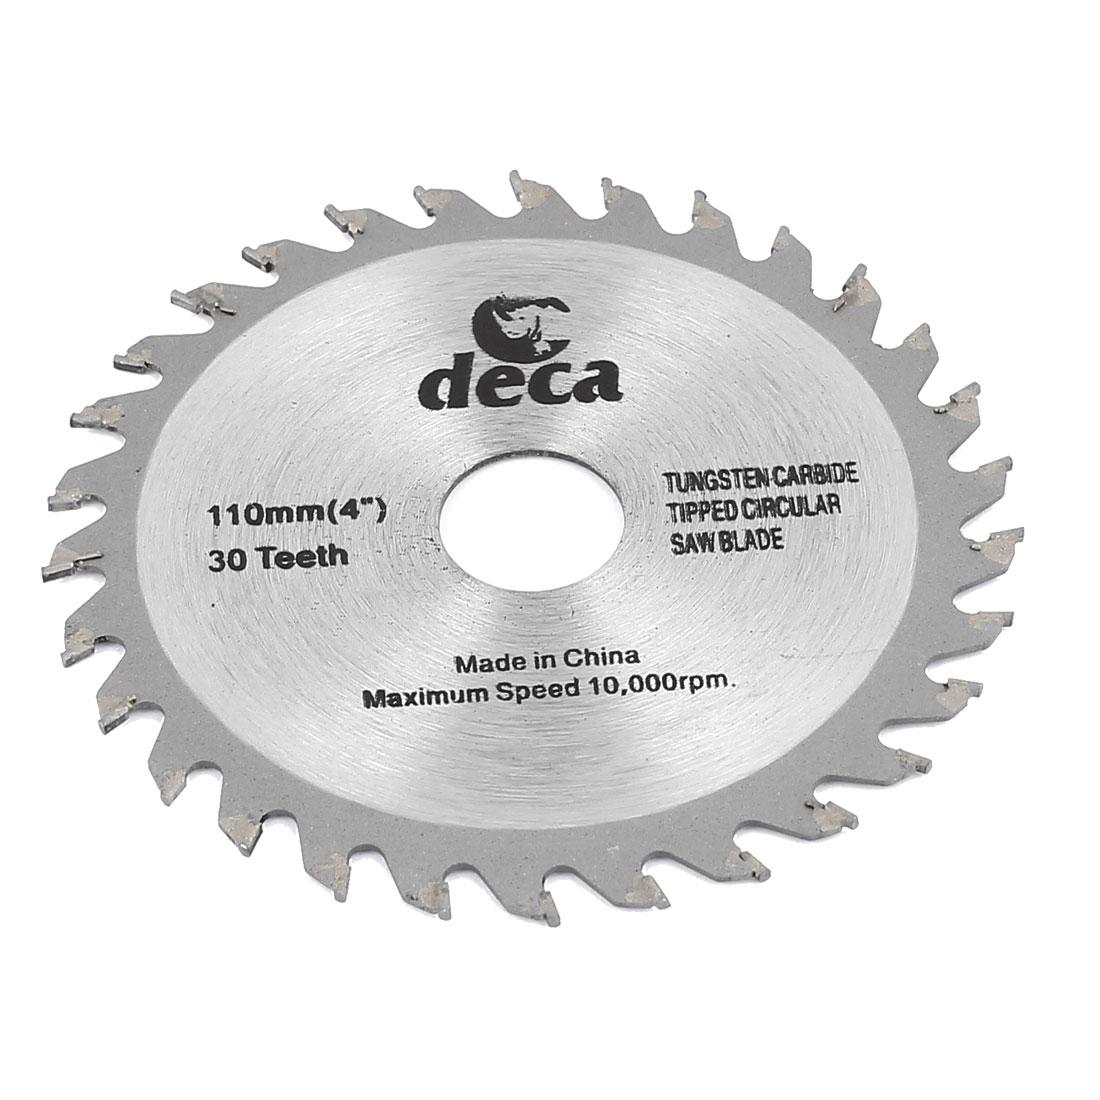 "Wood Cutting 110mm 4"" 30T Teeth Slitting Circular Saw Cutter Rotary Tool"